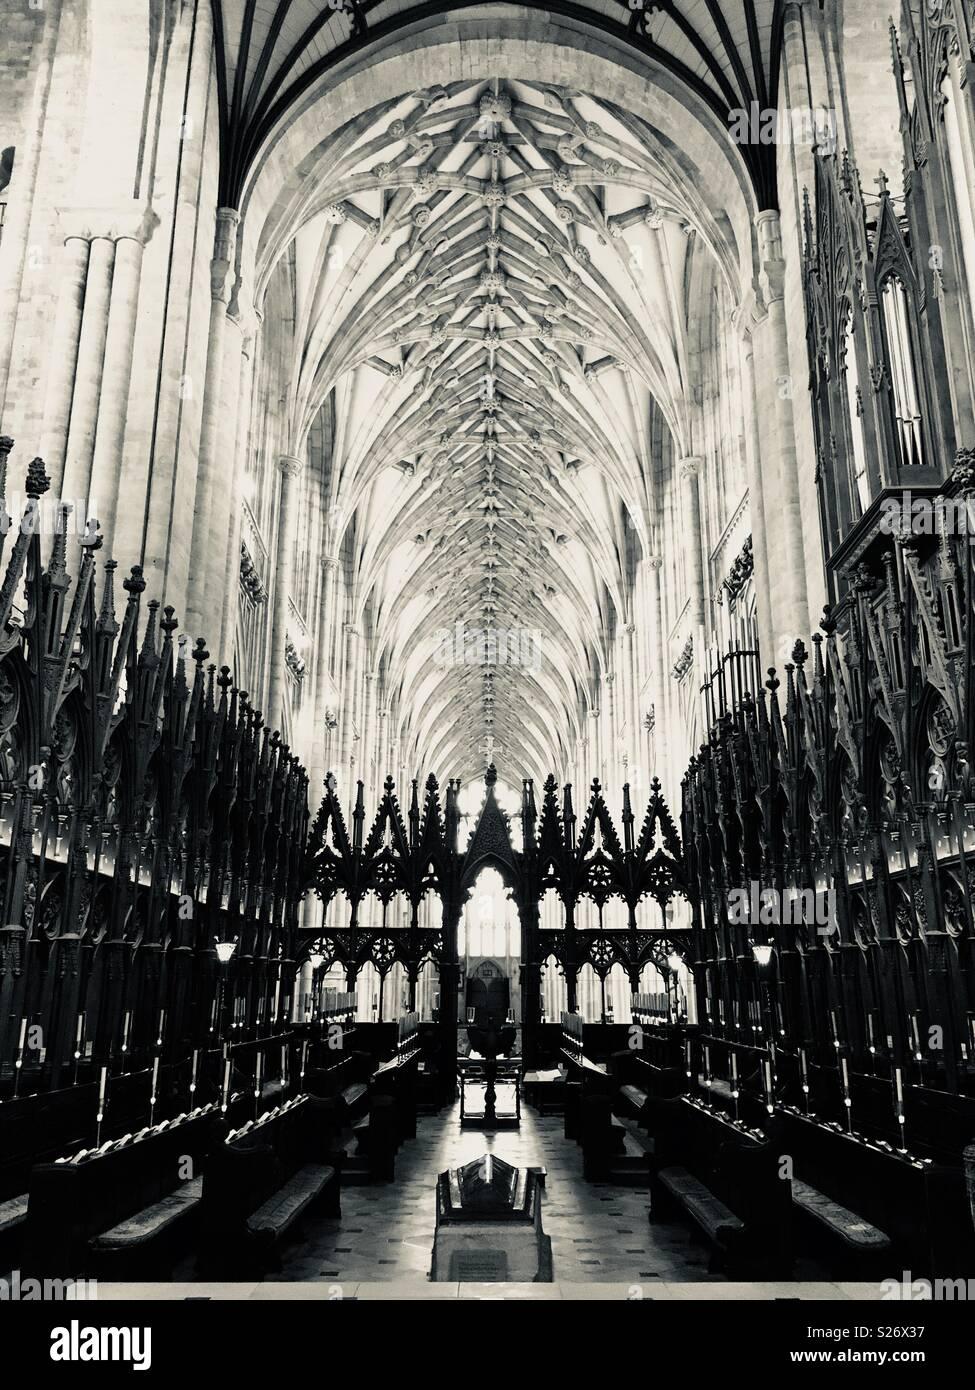 Interior de la catedral de Winchester Imagen De Stock